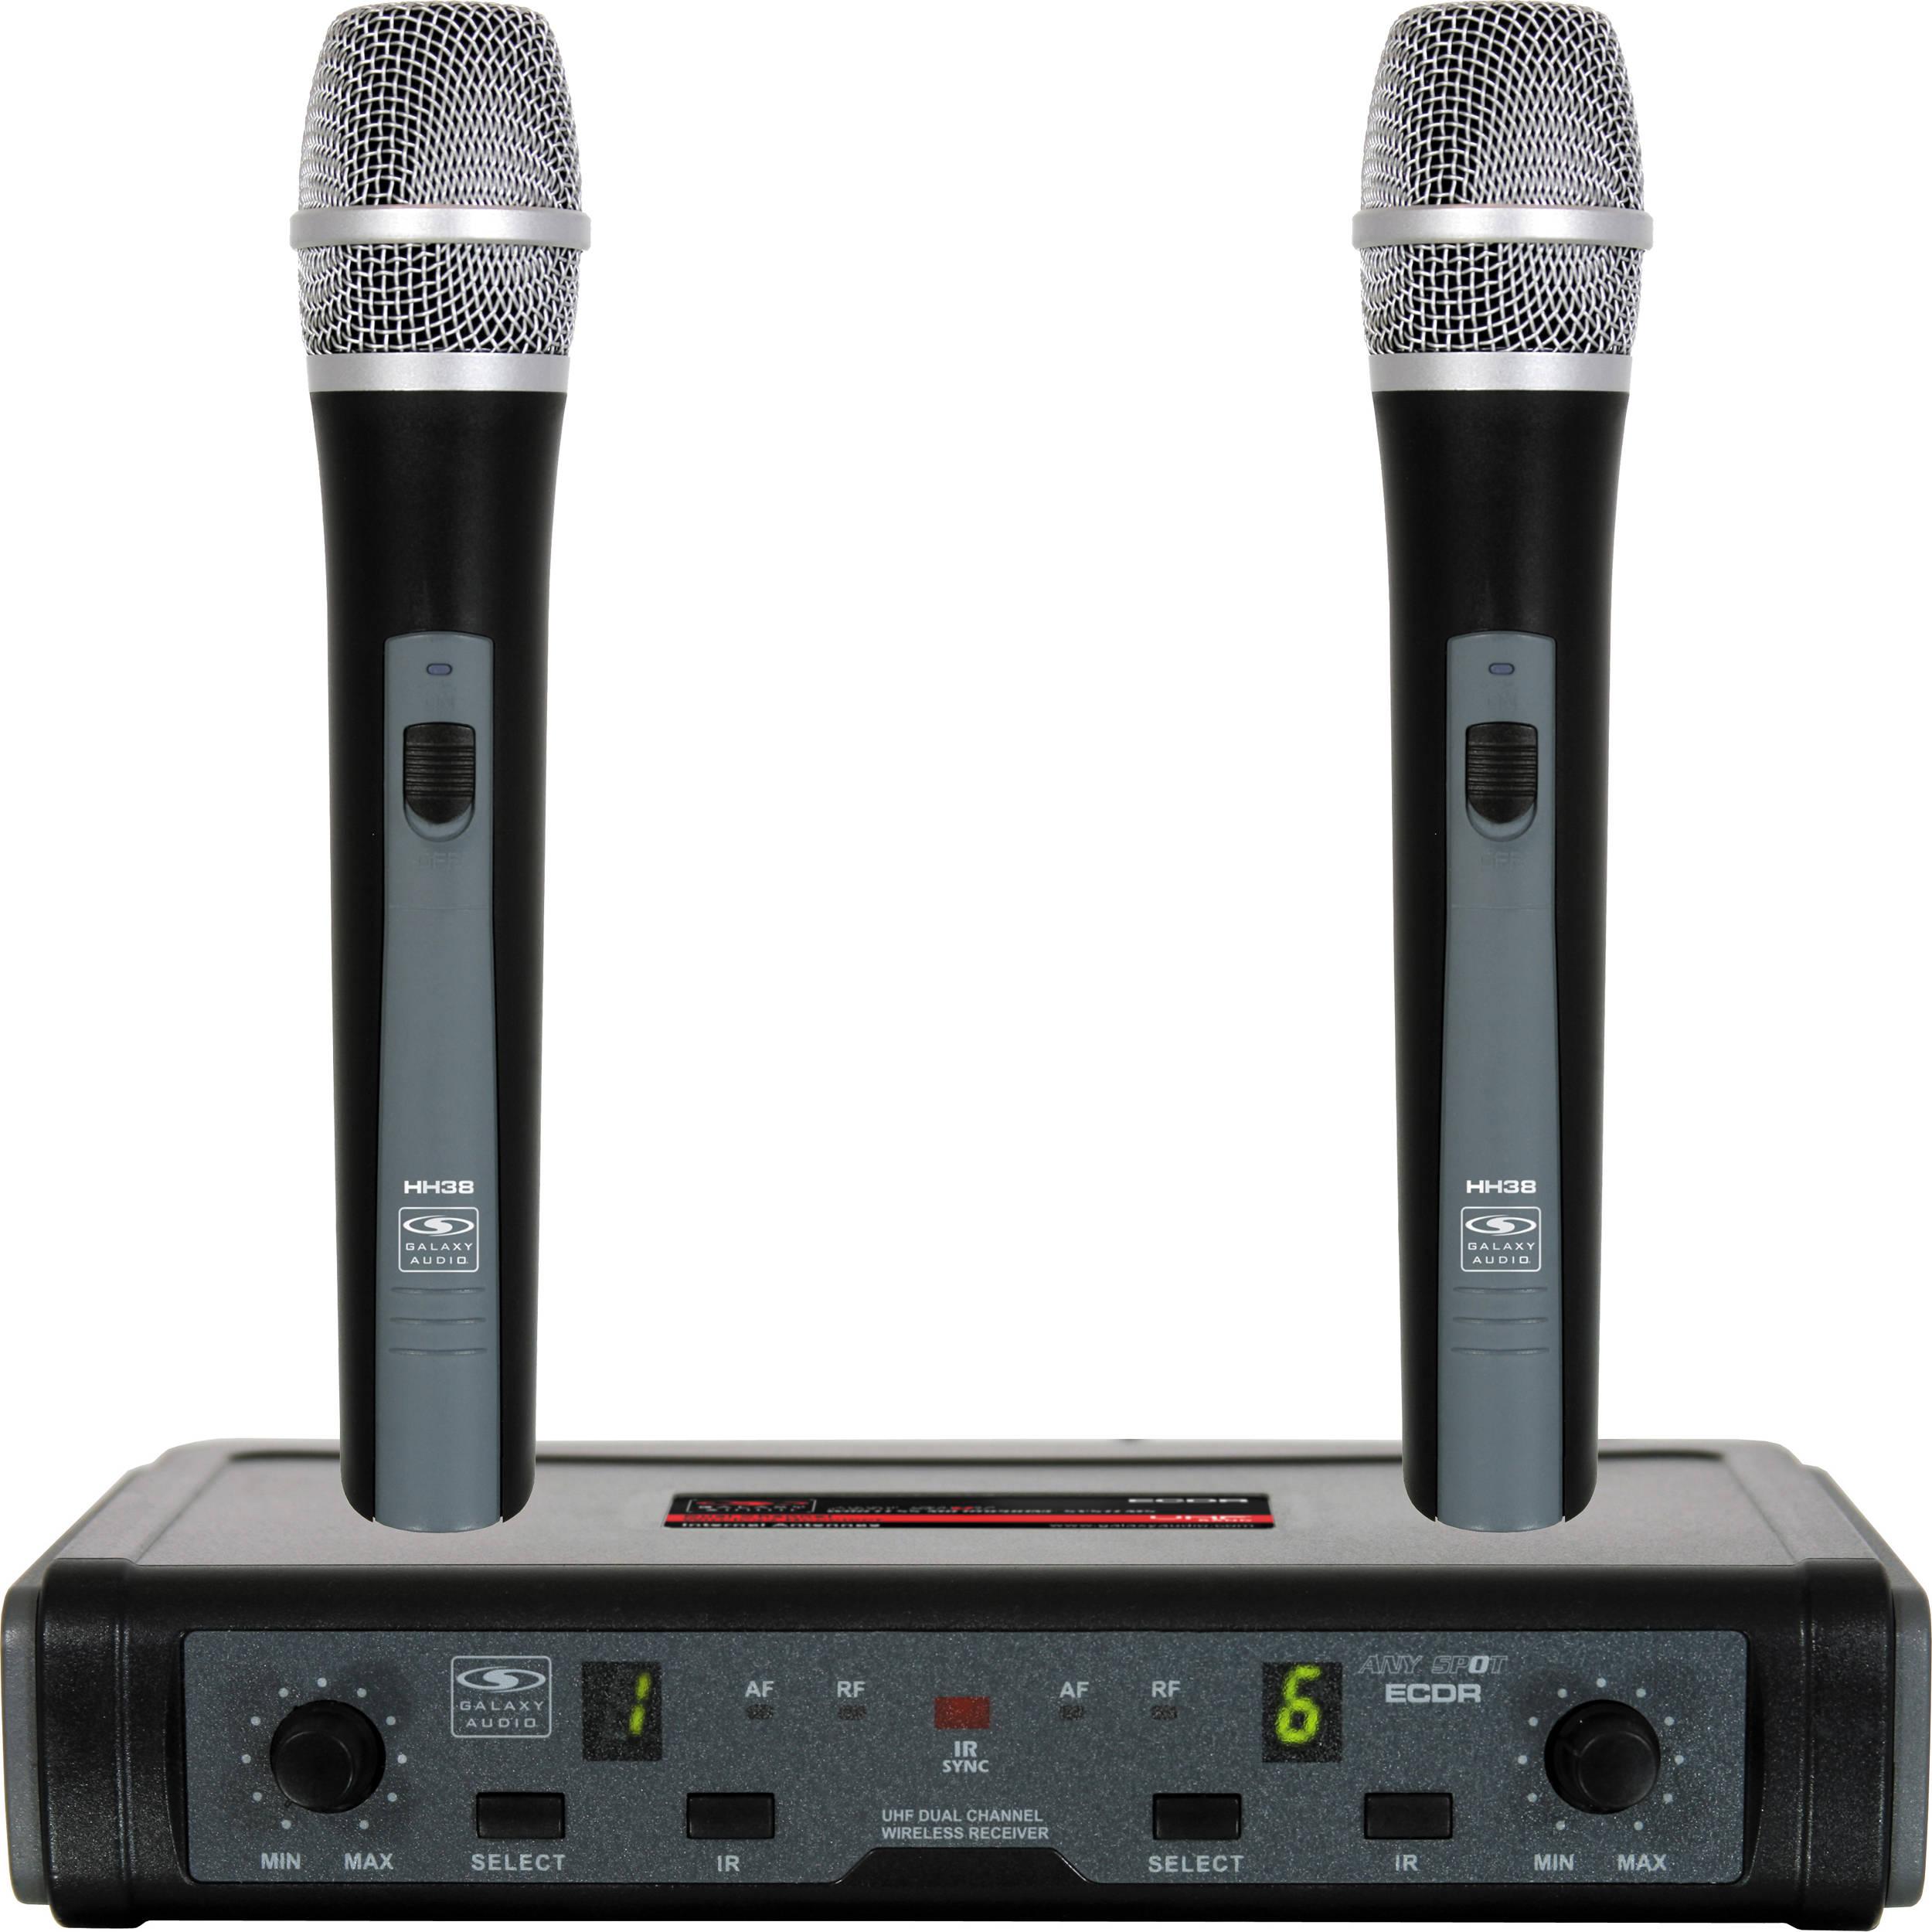 galaxy audio ecd wireless microphone system ecdr 2hh38 d b h. Black Bedroom Furniture Sets. Home Design Ideas